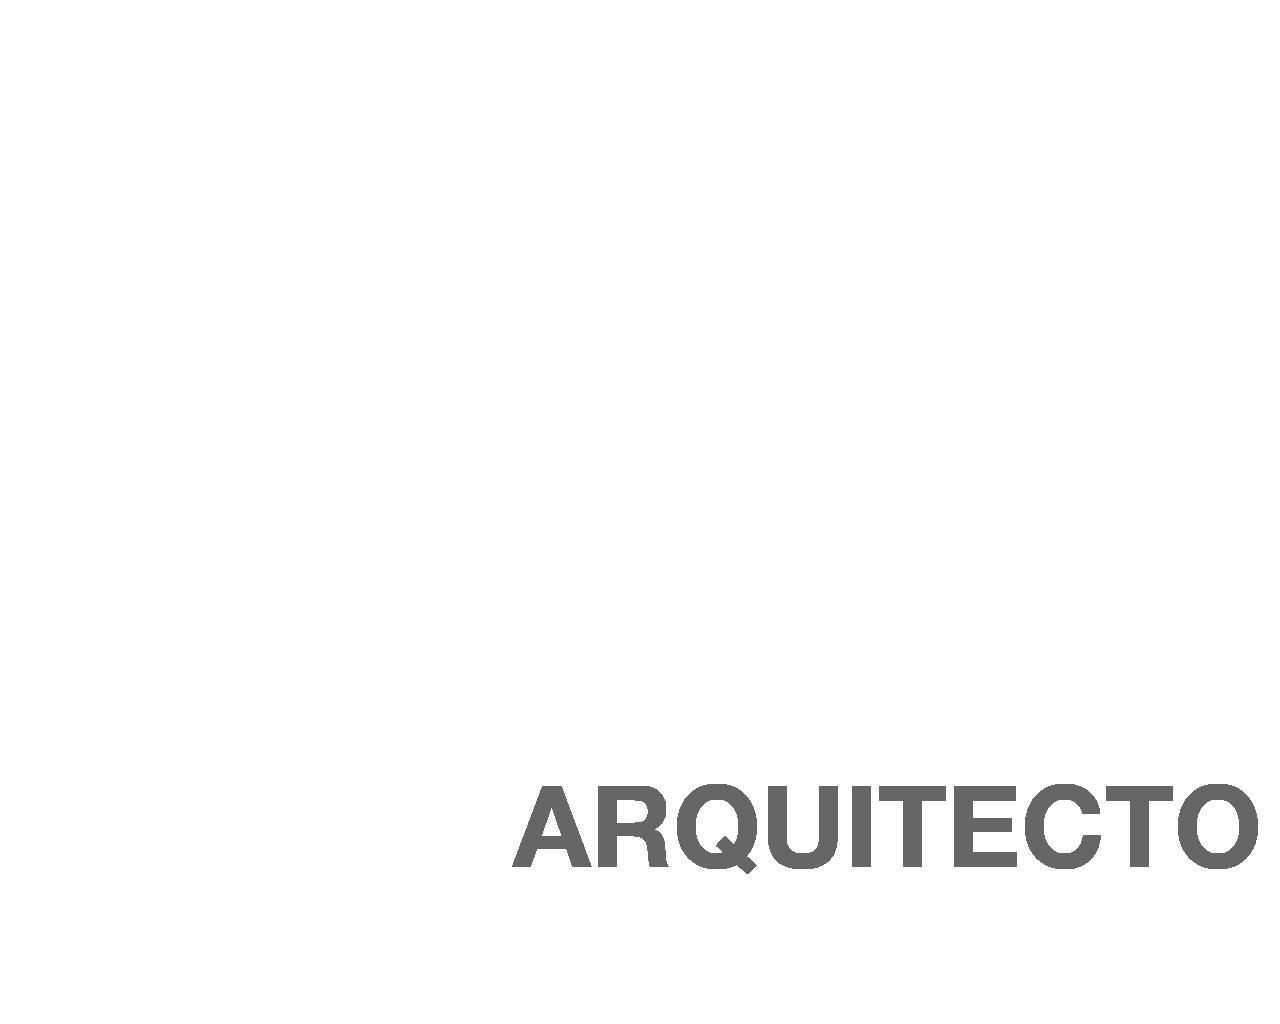 Hugo Tapia